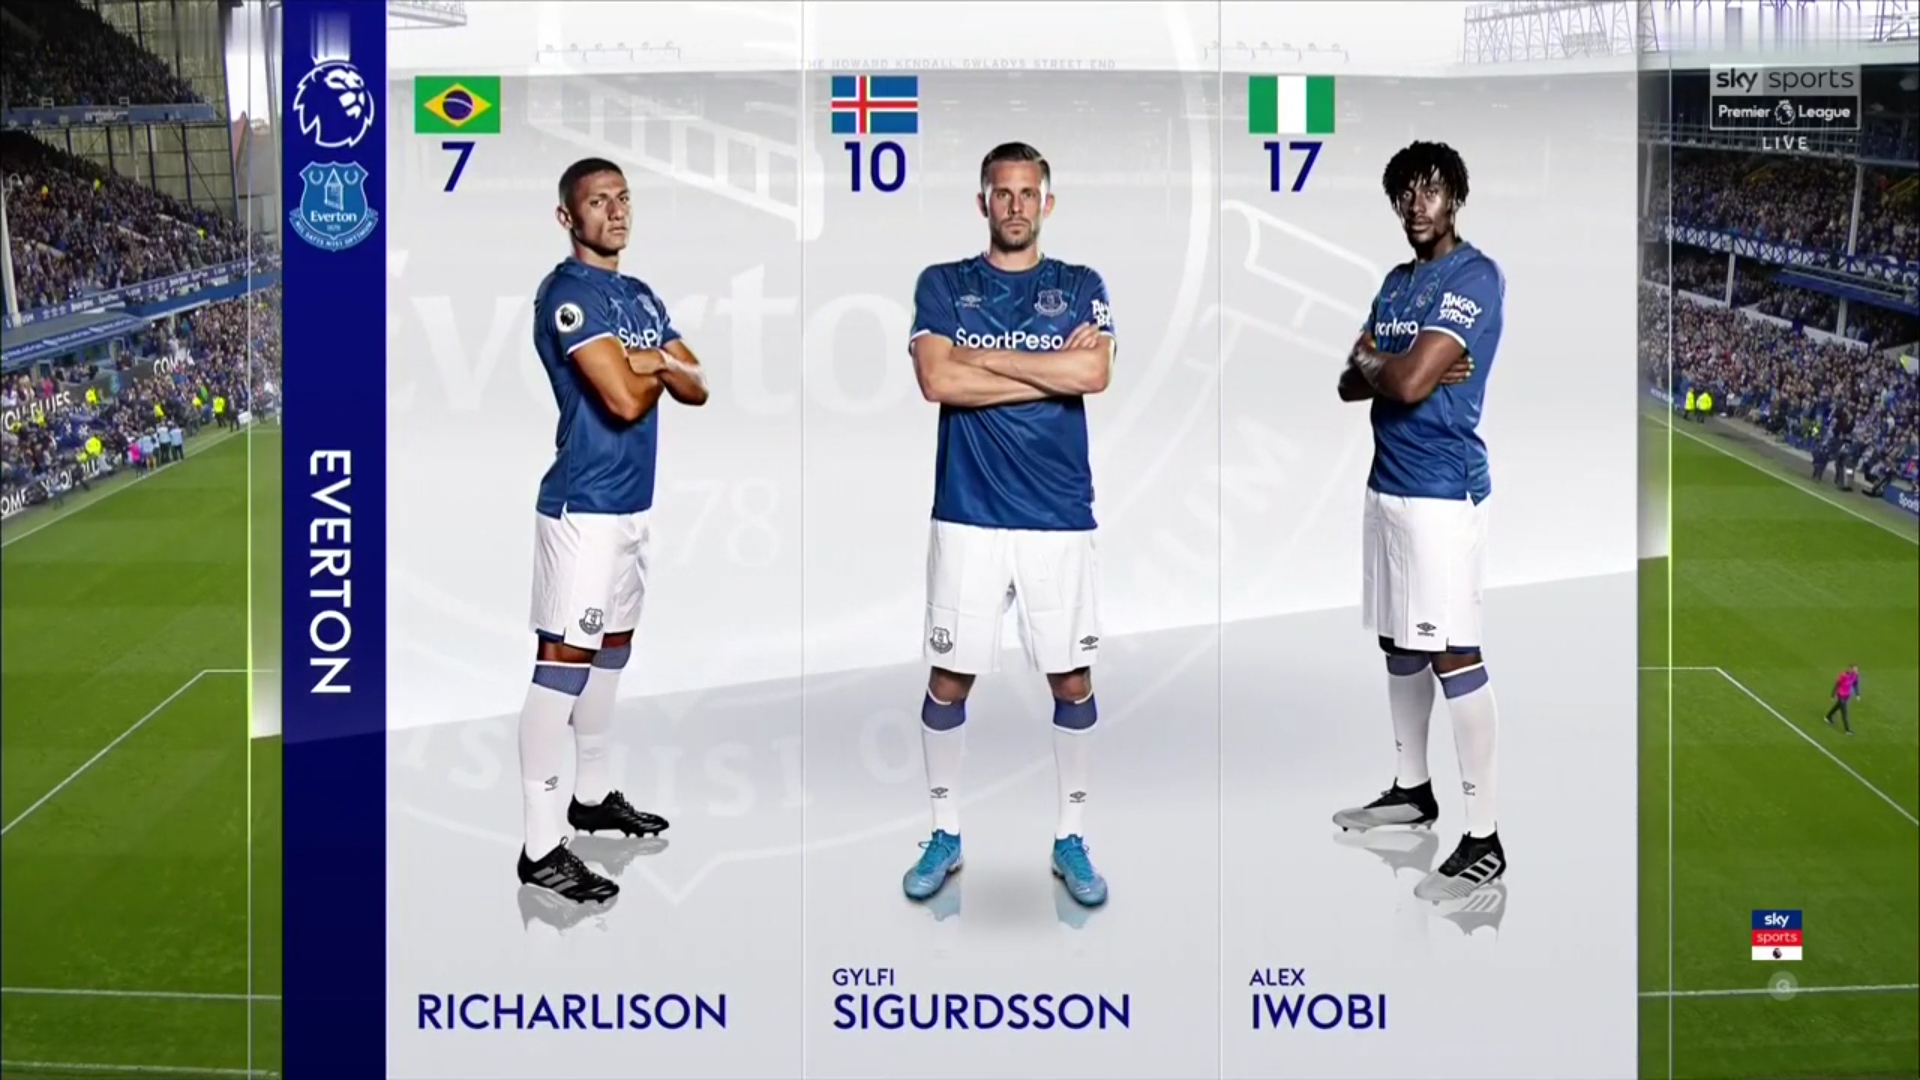 01-09-2019 - Everton 3-2 Wolverhampton Wanderers